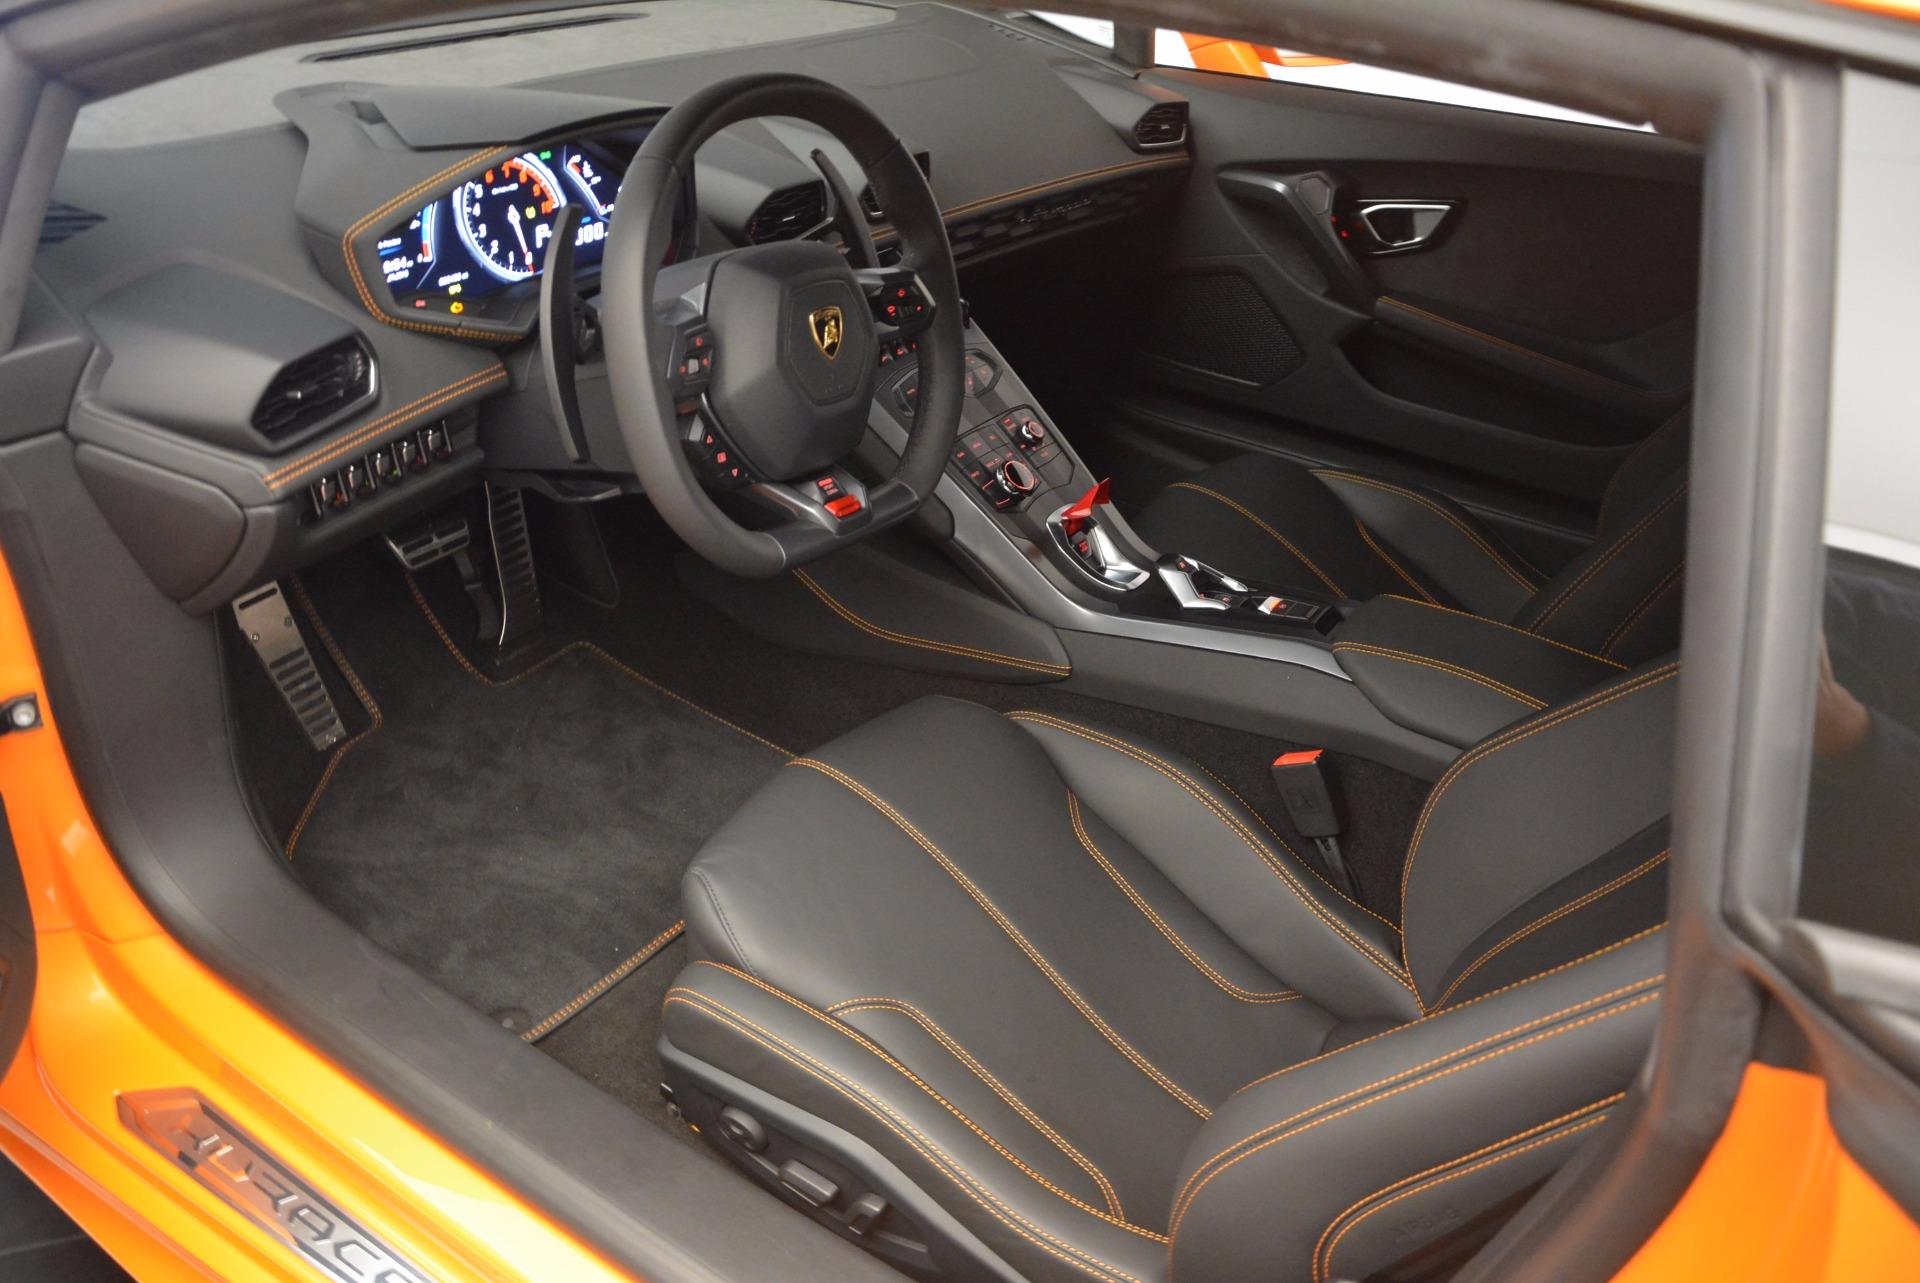 Used 2015 Lamborghini Huracan LP 610-4 For Sale In Greenwich, CT 621_p13